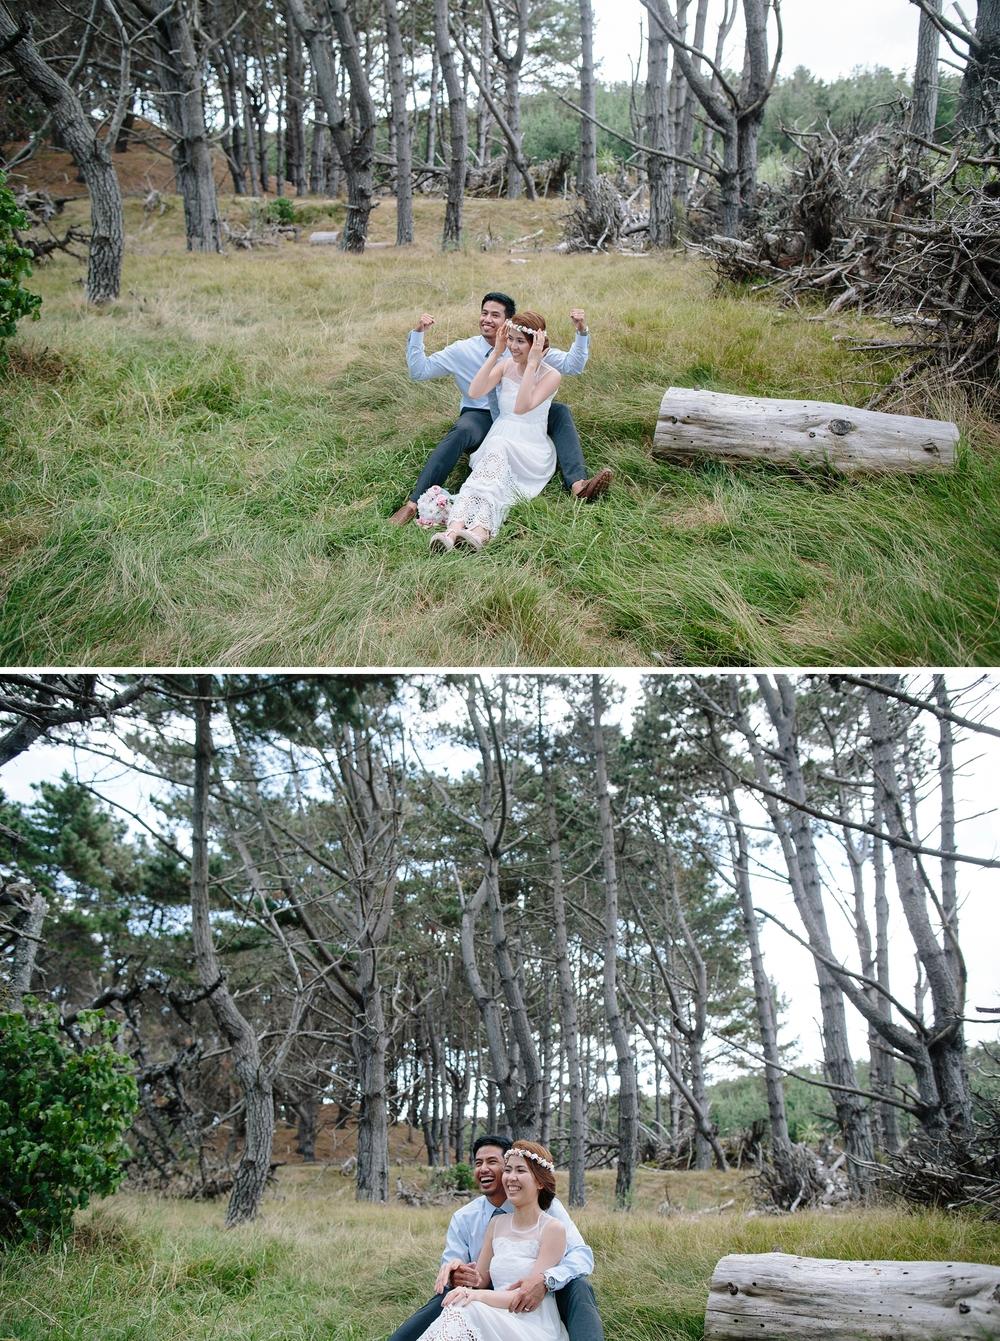 RamGia_Auckland Wedding Photographer_Patty Lagera_0052.jpg